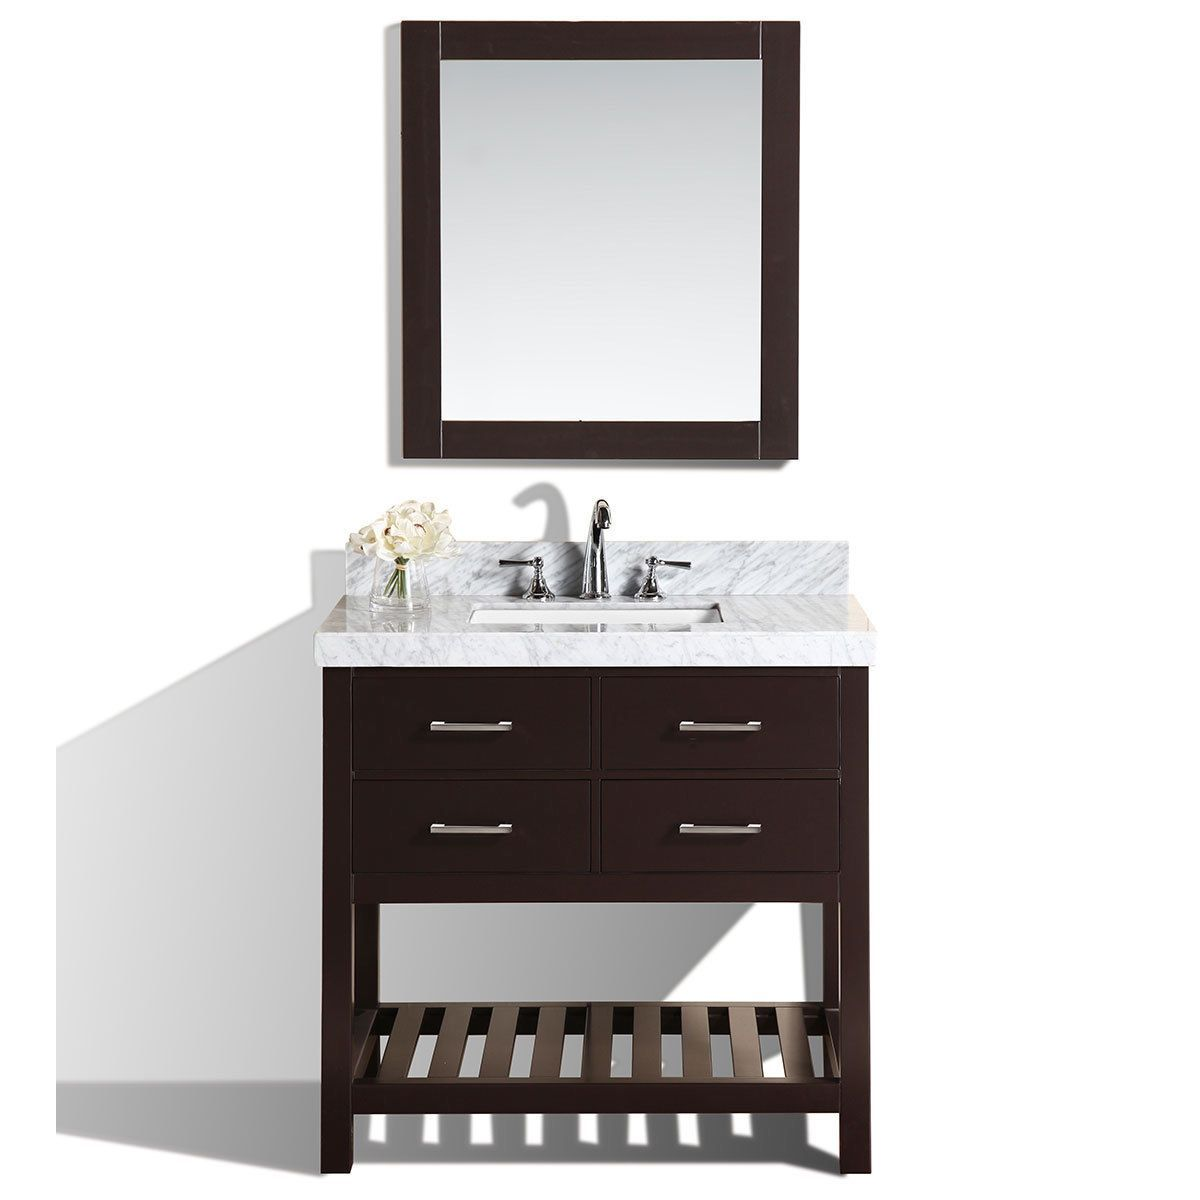 Explore Modern Bathroom Vanities And More!